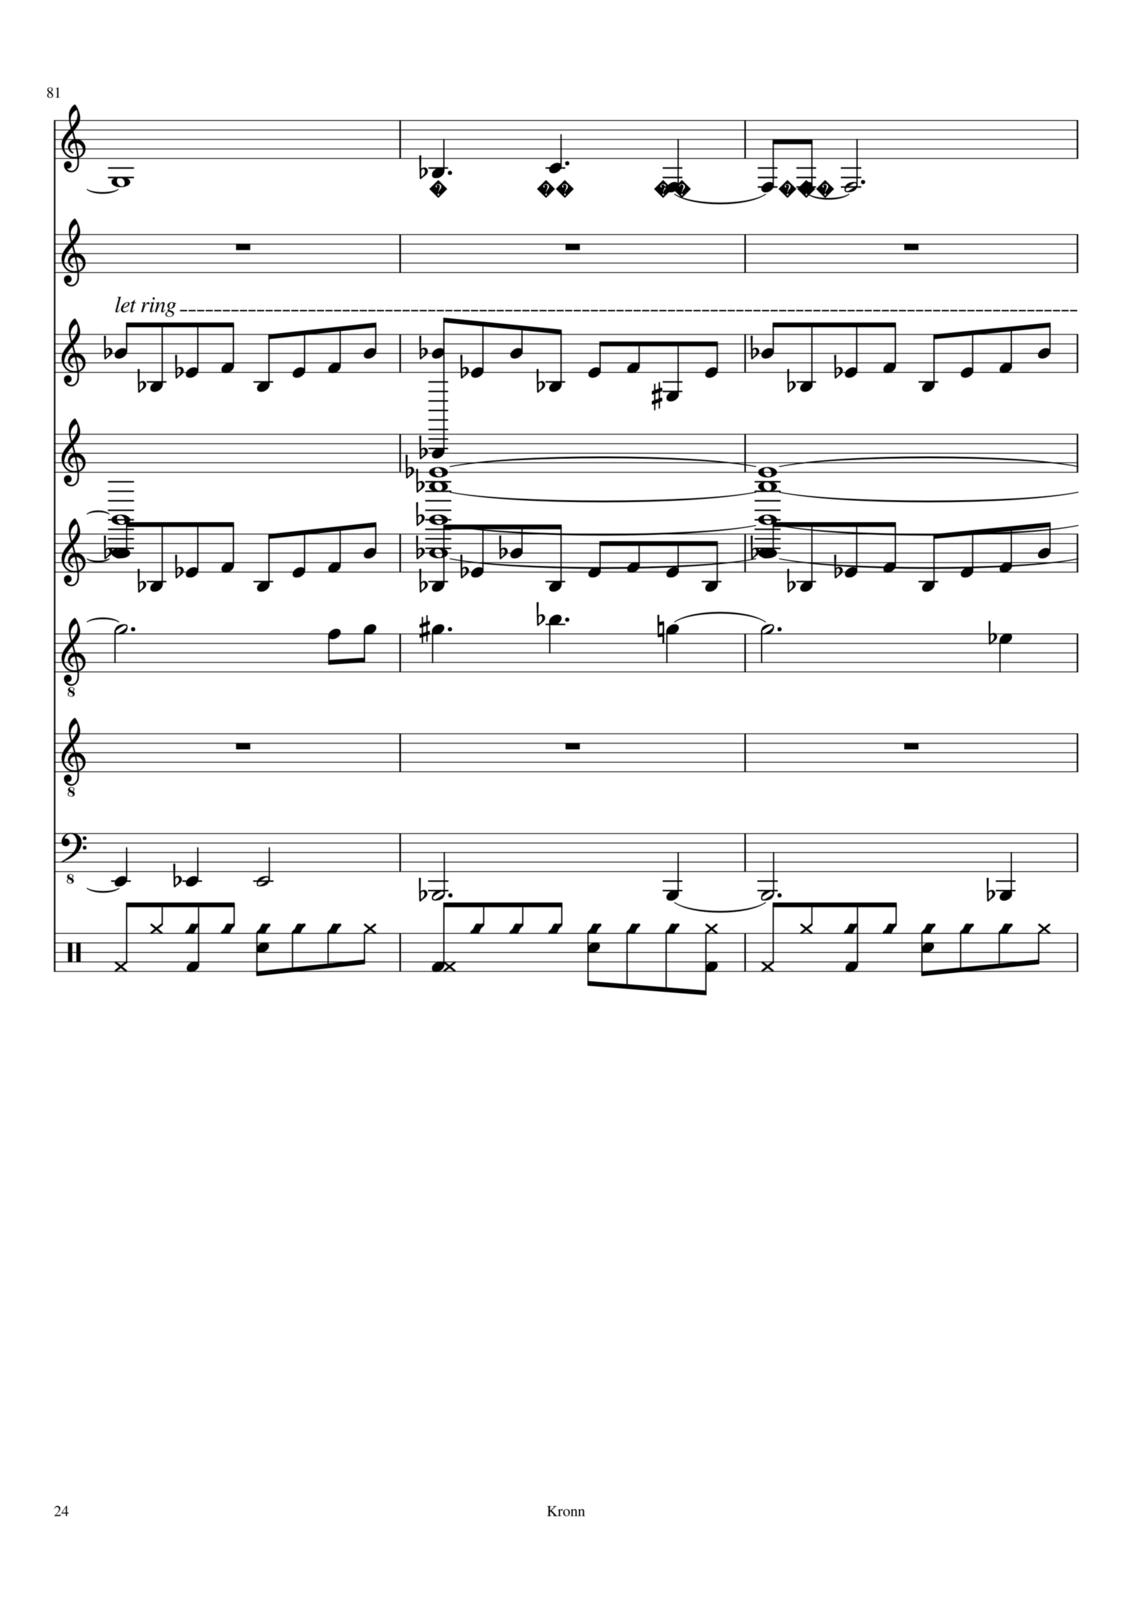 Okean Pustotyi slide, Image 24